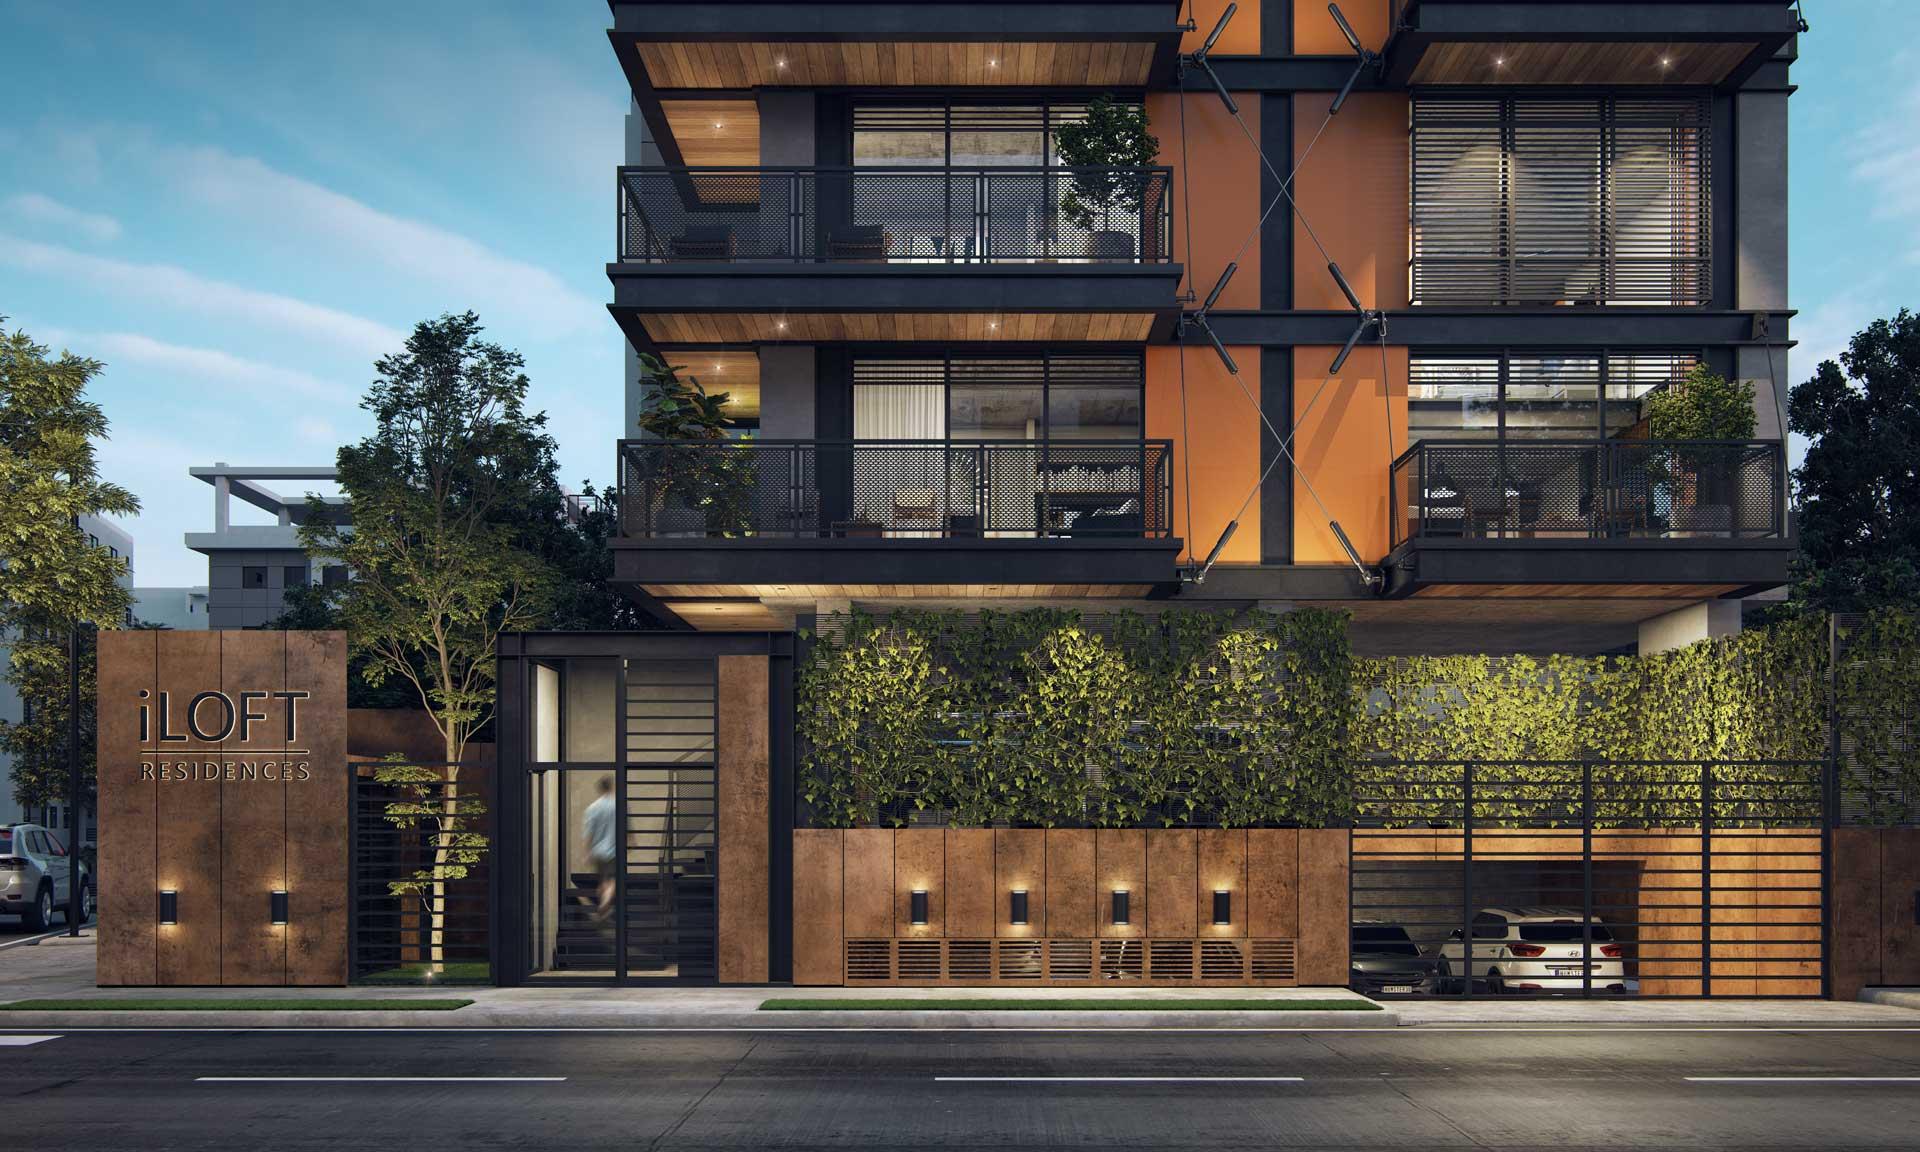 A20-Arquitectos-iLoft-Residences-Renders-01